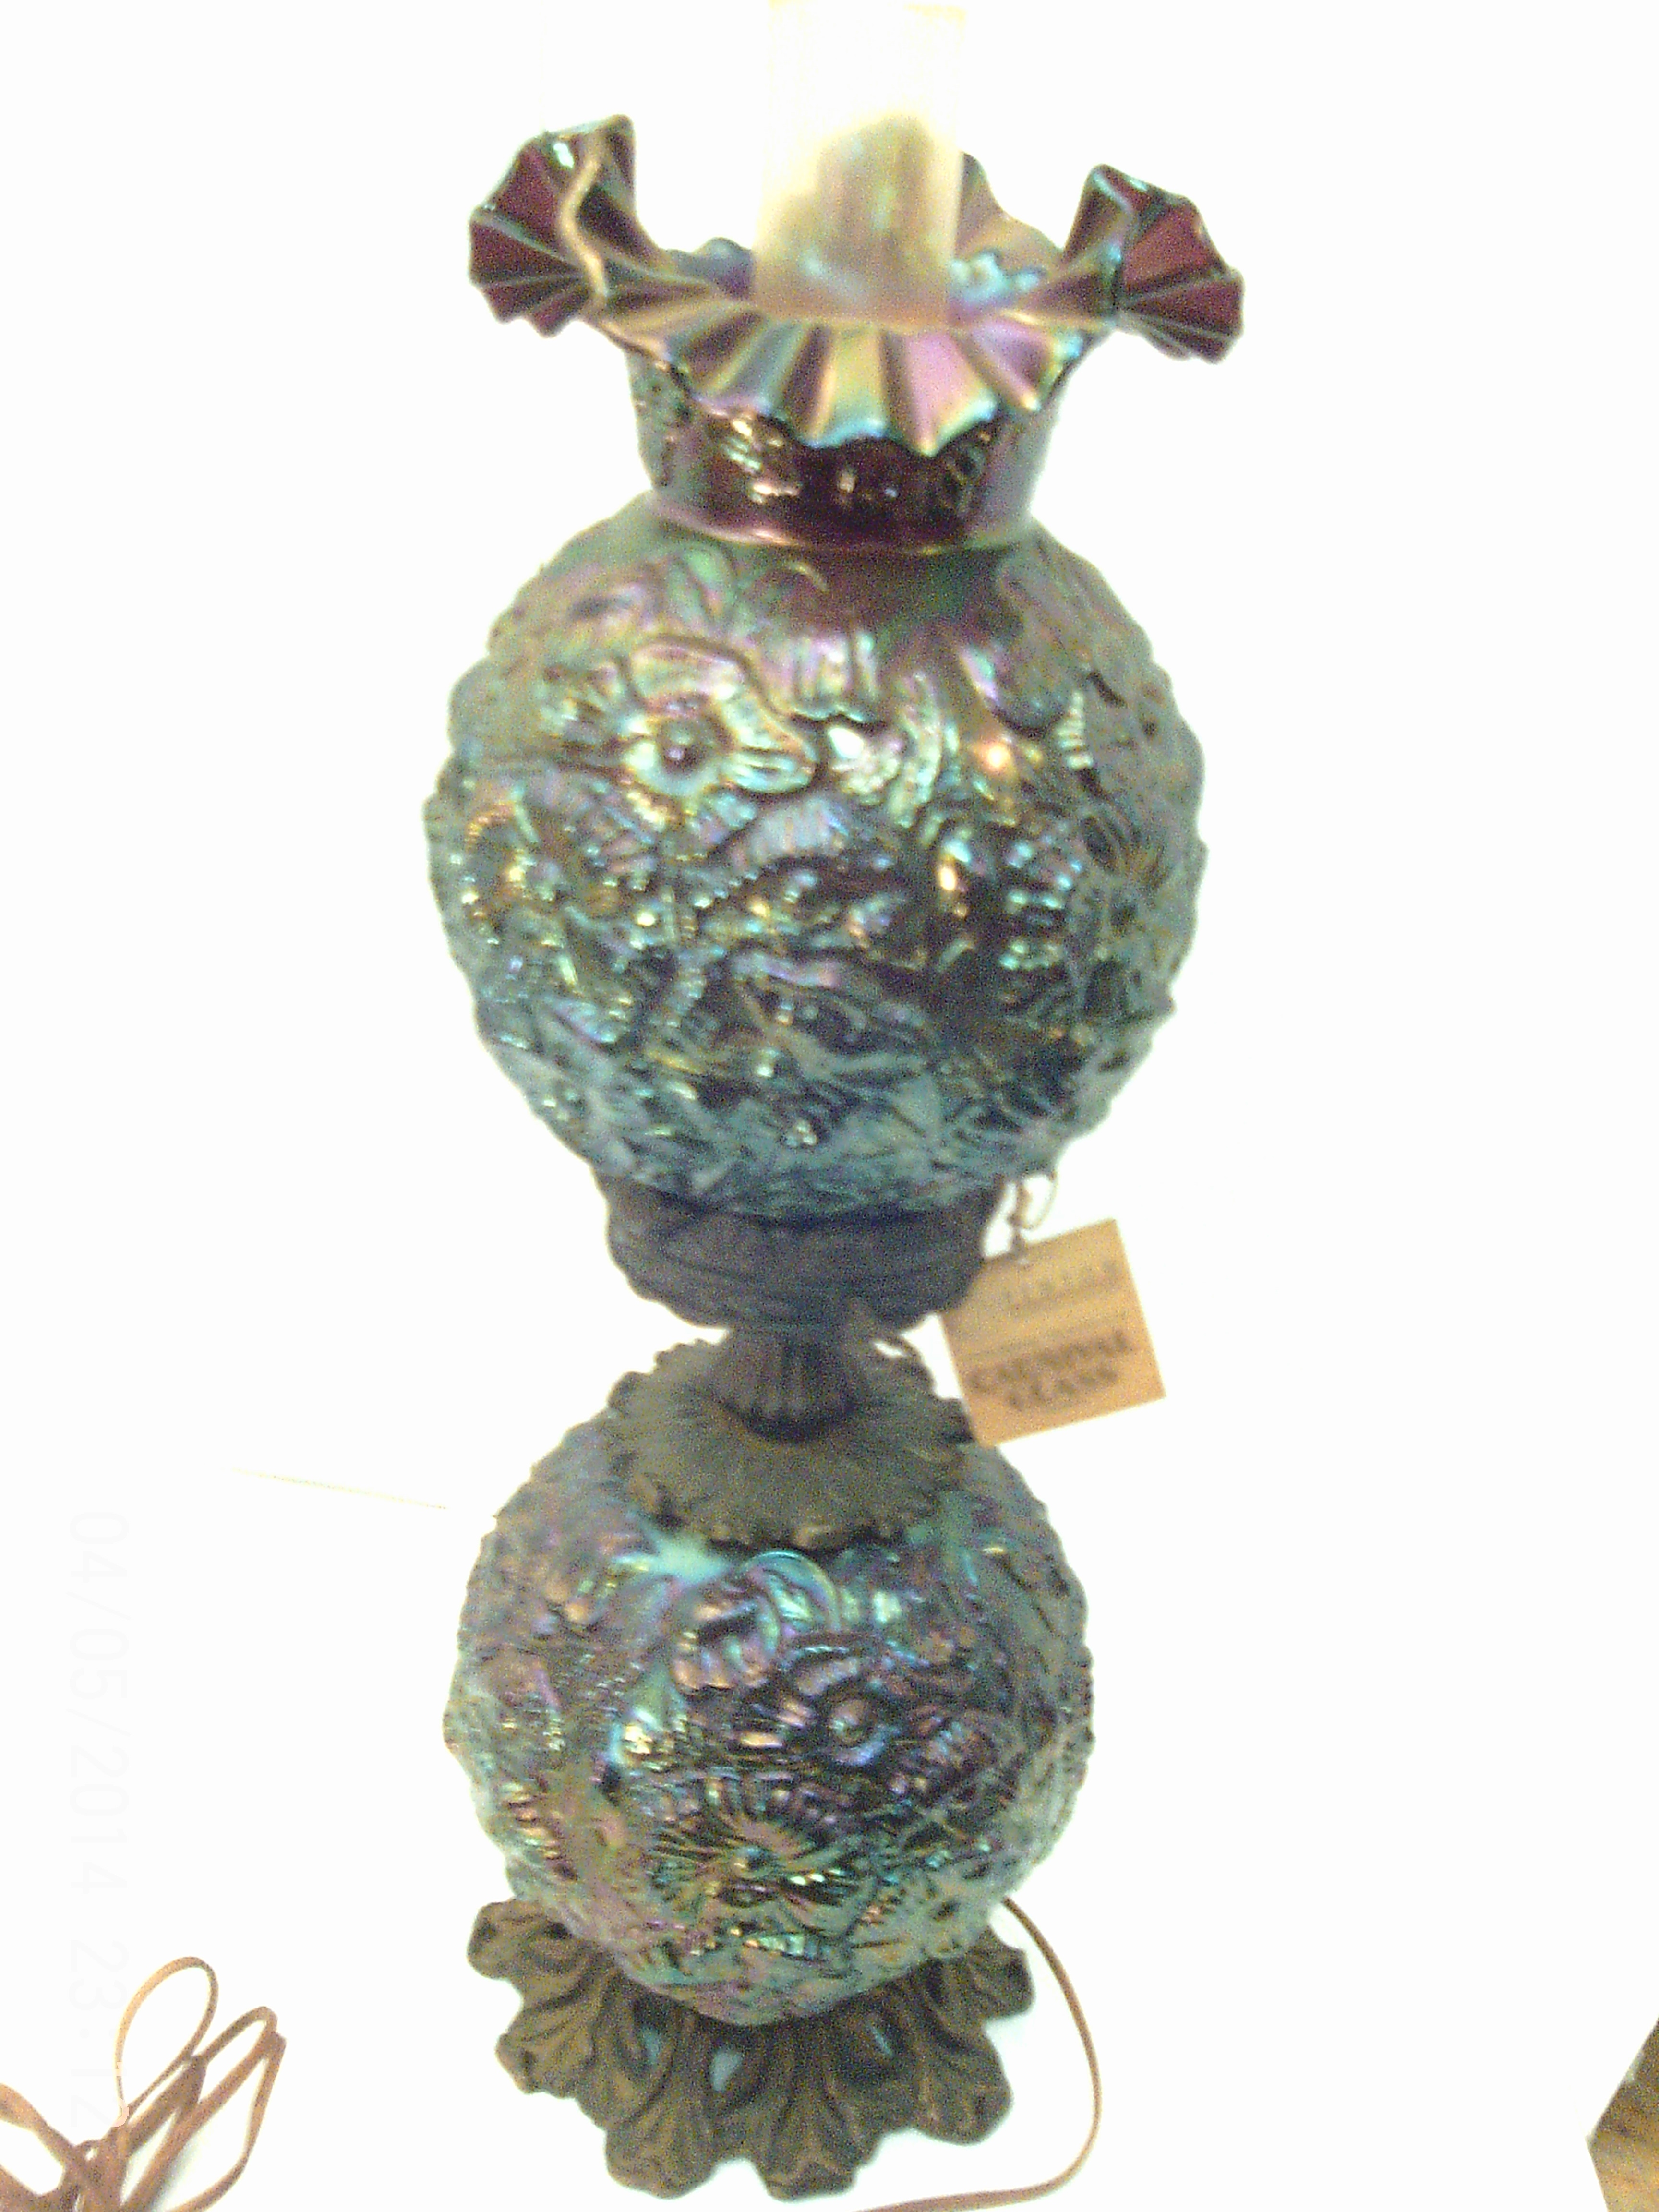 Carnival glass lamp antique appraisal